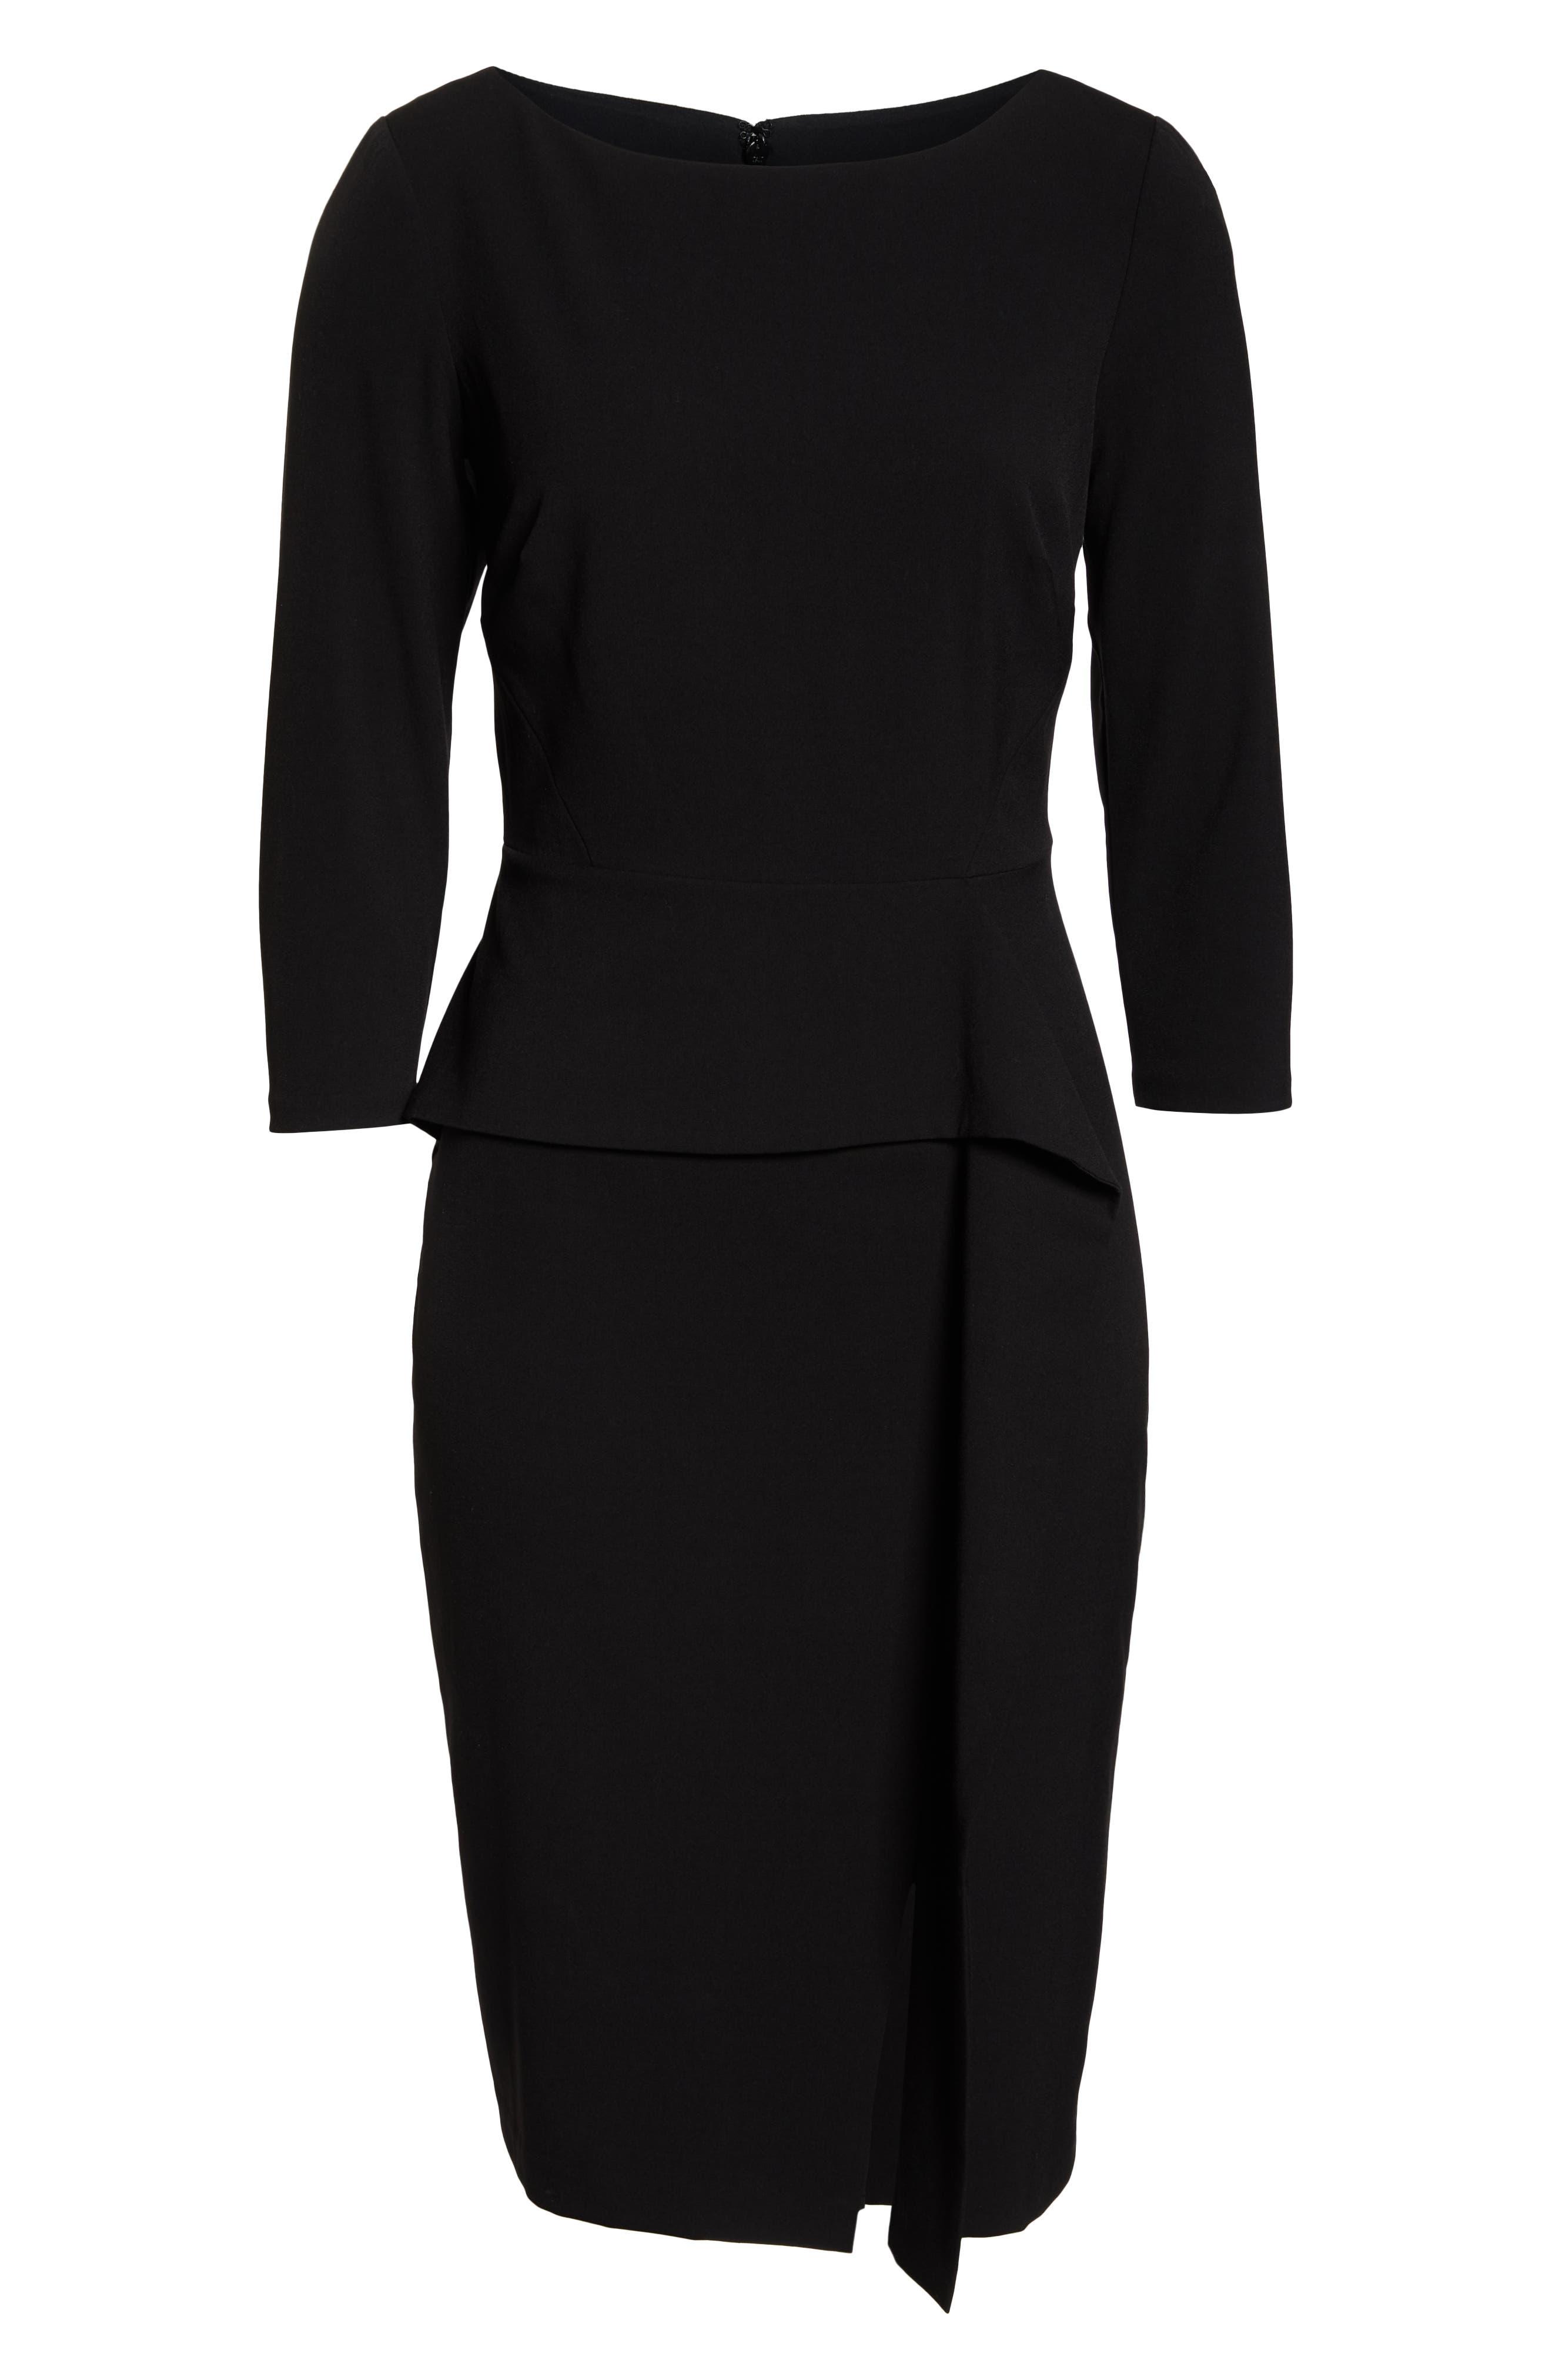 VINCE CAMUTO,                             Angled Ruffle Sheath Dress,                             Alternate thumbnail 7, color,                             BLACK